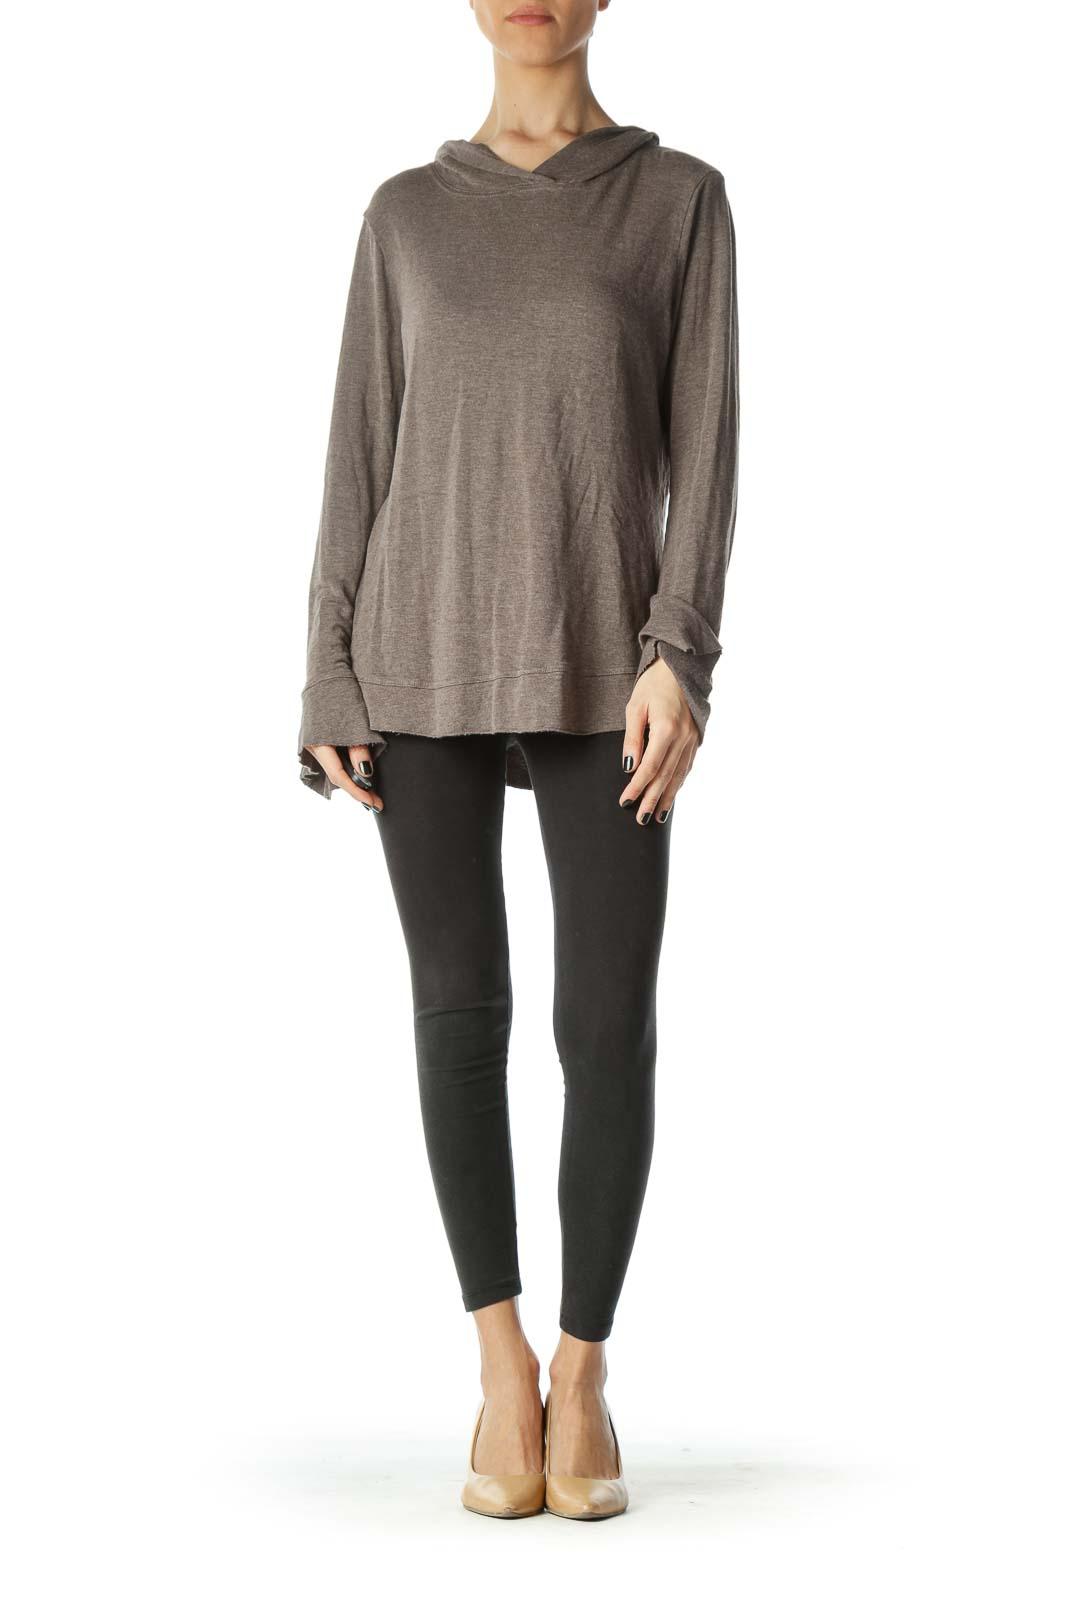 Brown Hooded Sweatshirt Front